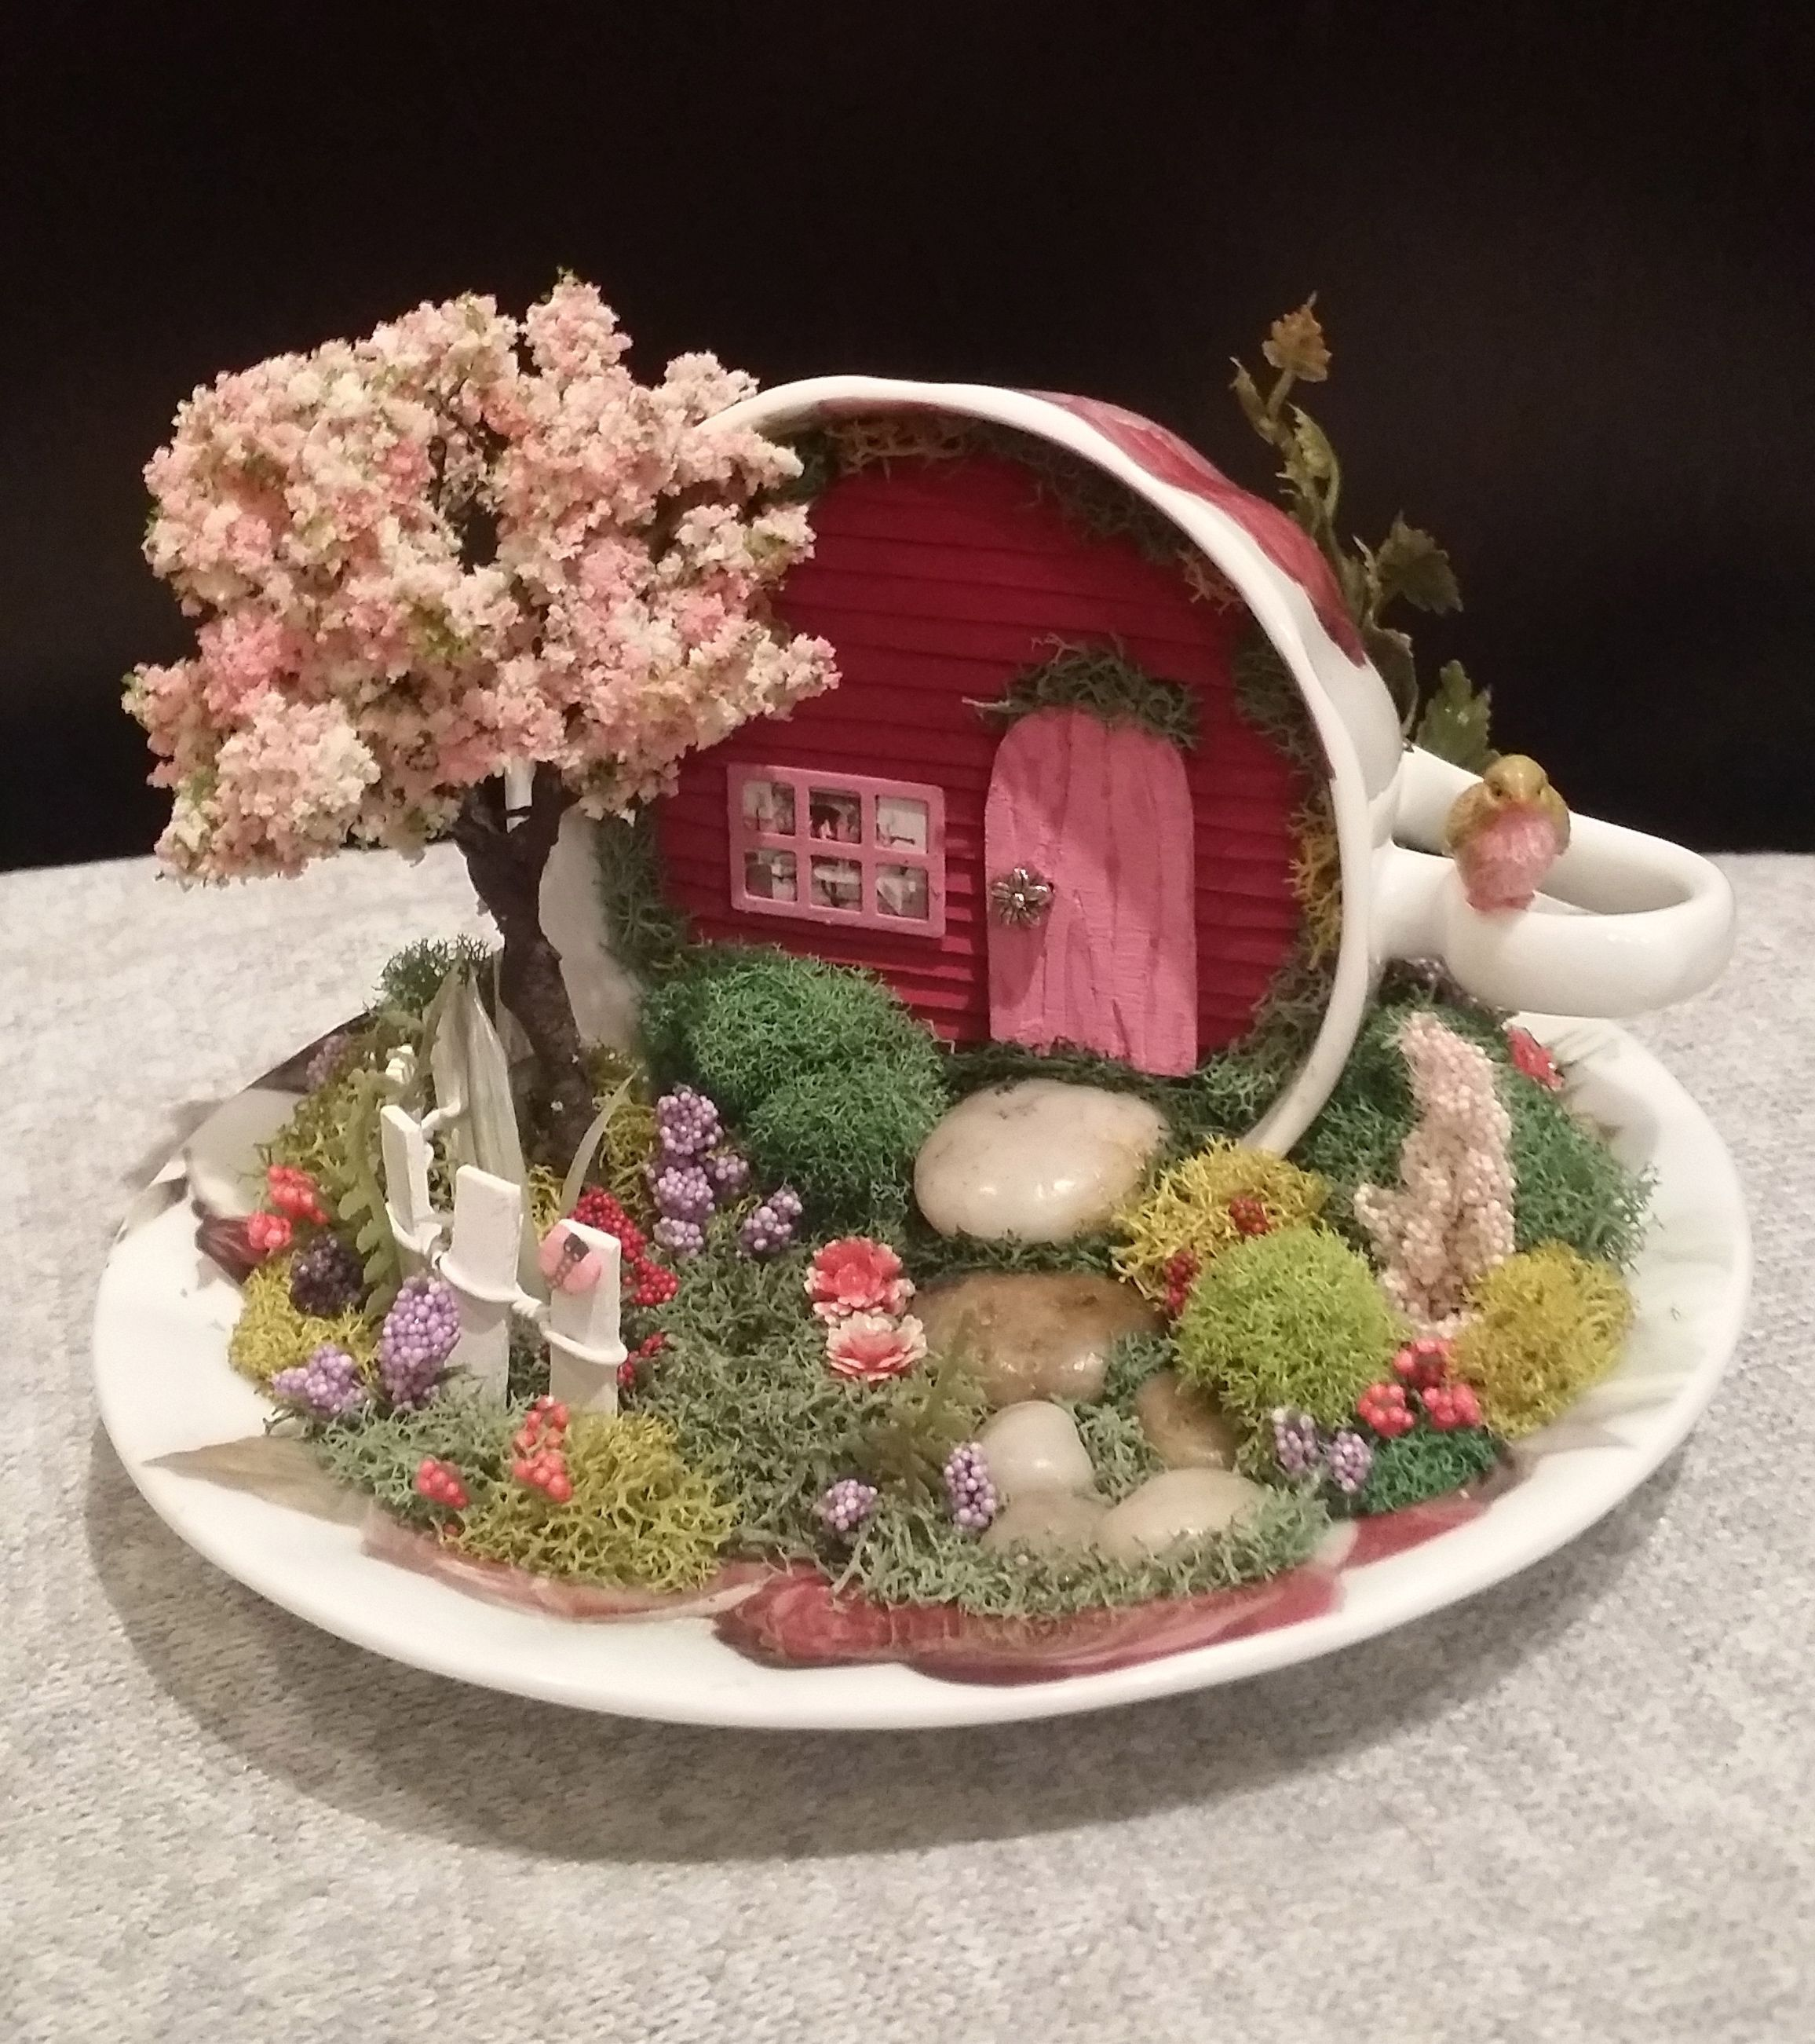 Distinctive Diy Fairy Garden Ideas Diy Fairy Garden Ideas Diy Fairy Garden Ideas Fairy Garden Items